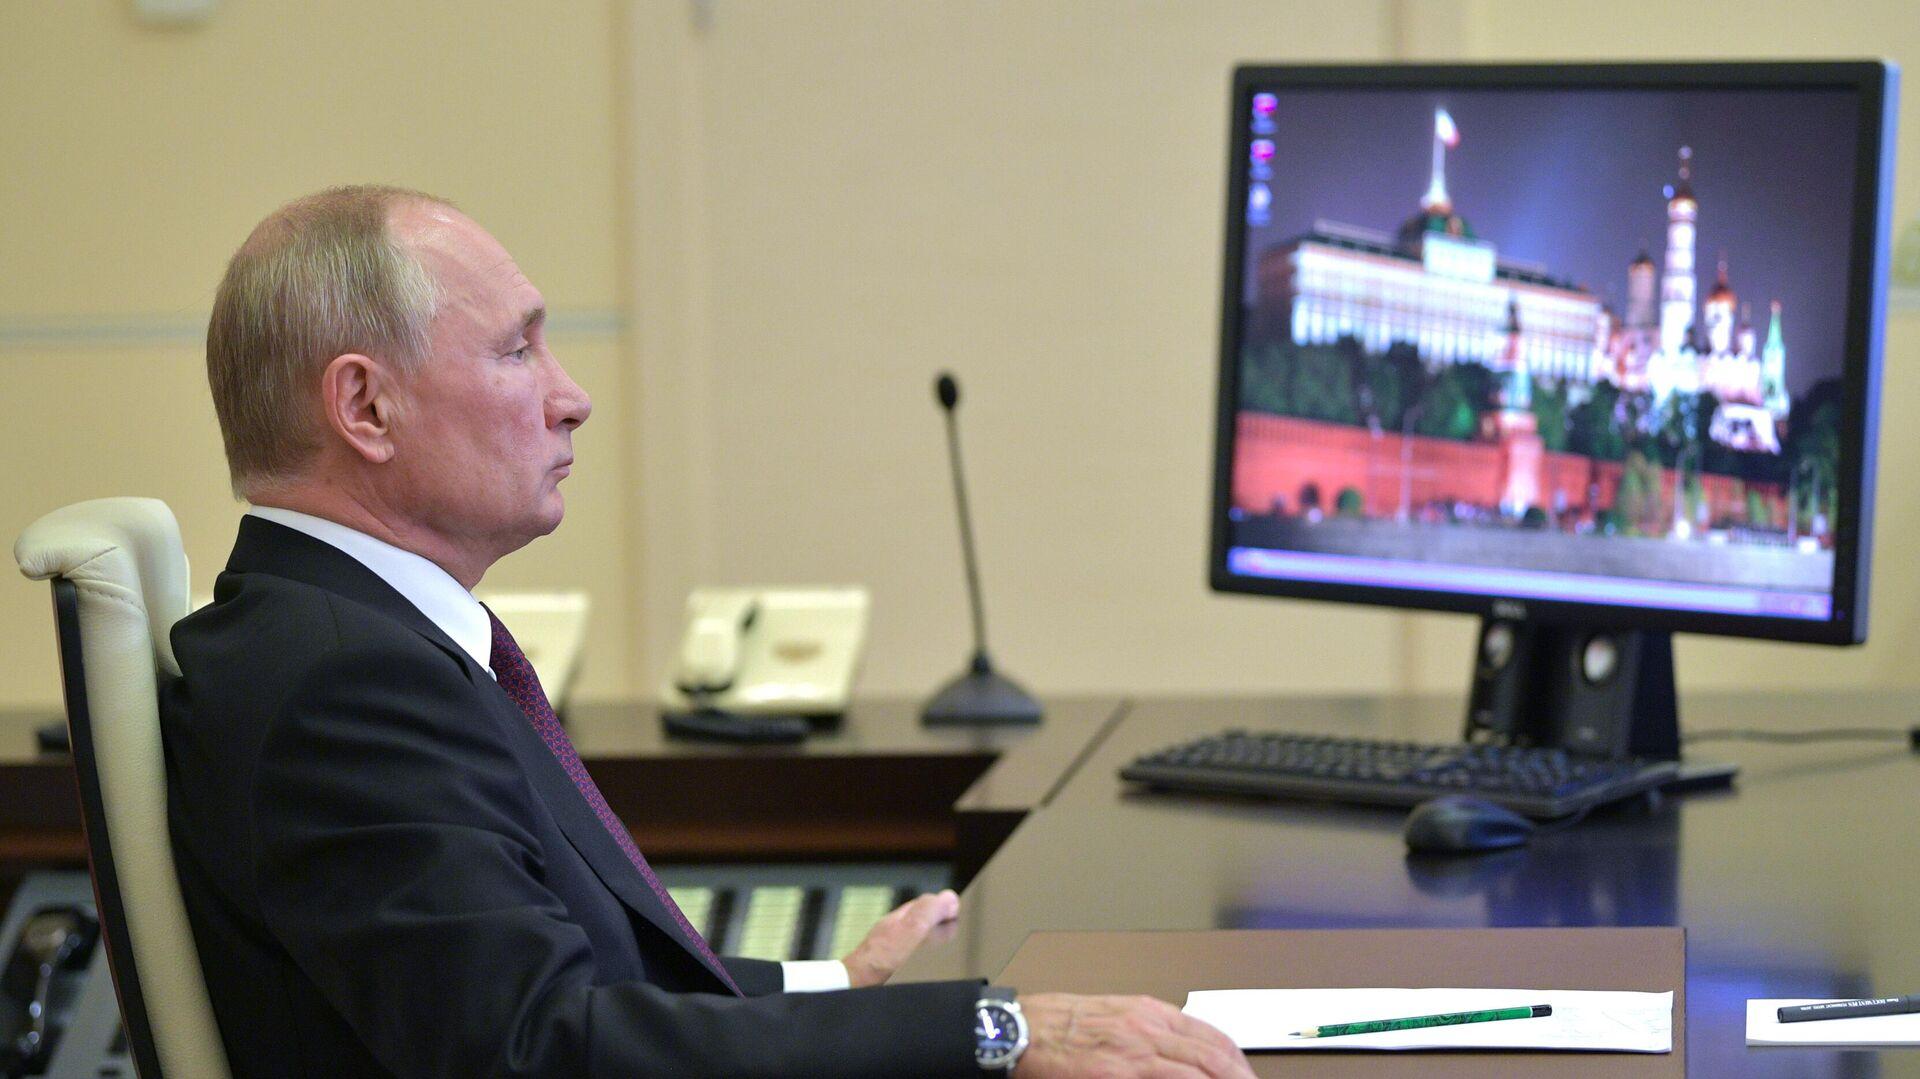 Президент РФ Владимир Путин во время видеоконференции - РИА Новости, 1920, 22.10.2020